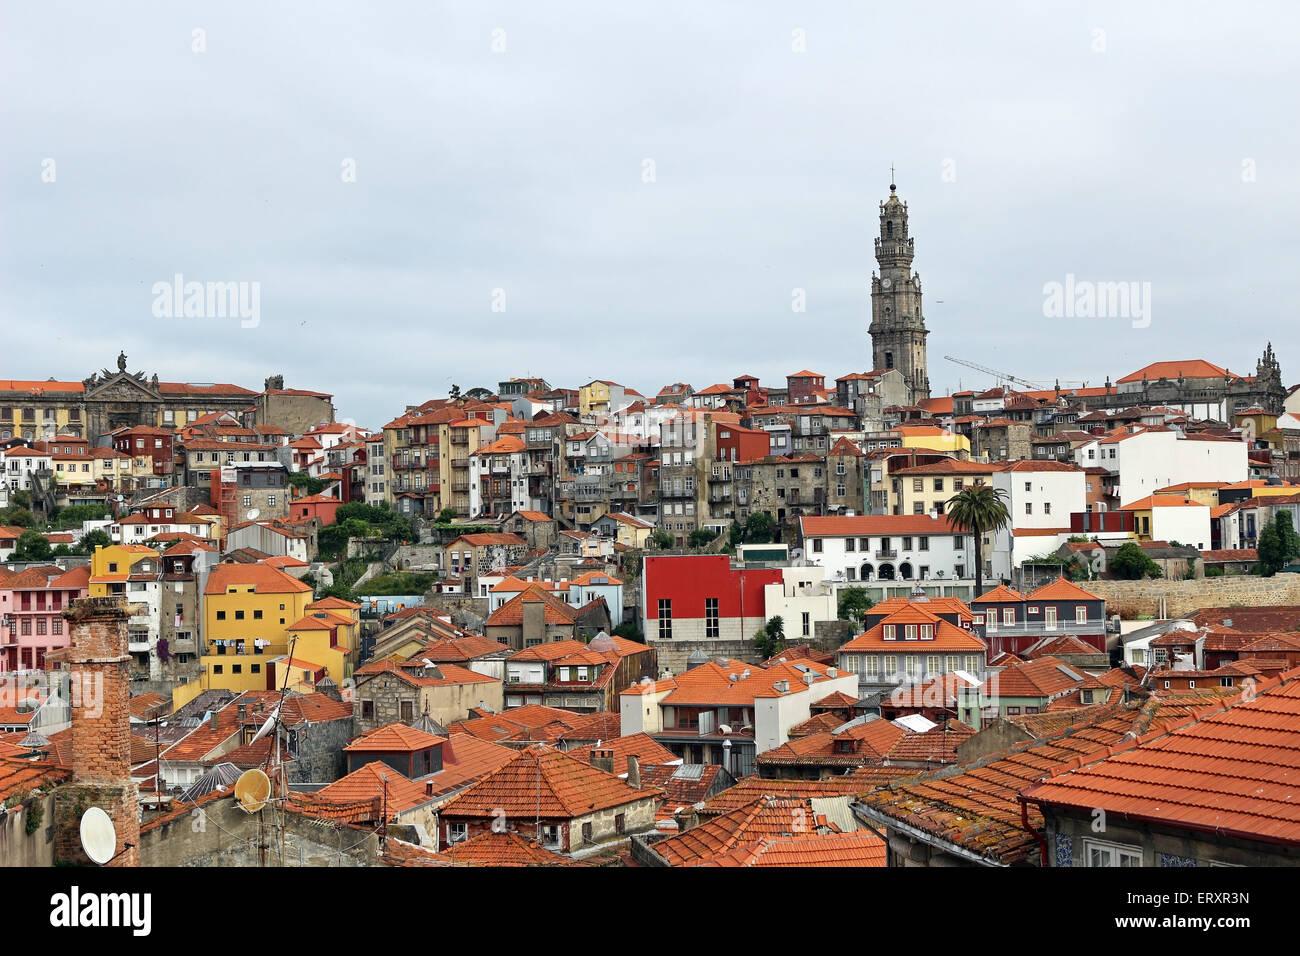 Oporto rooftop - Stock Image